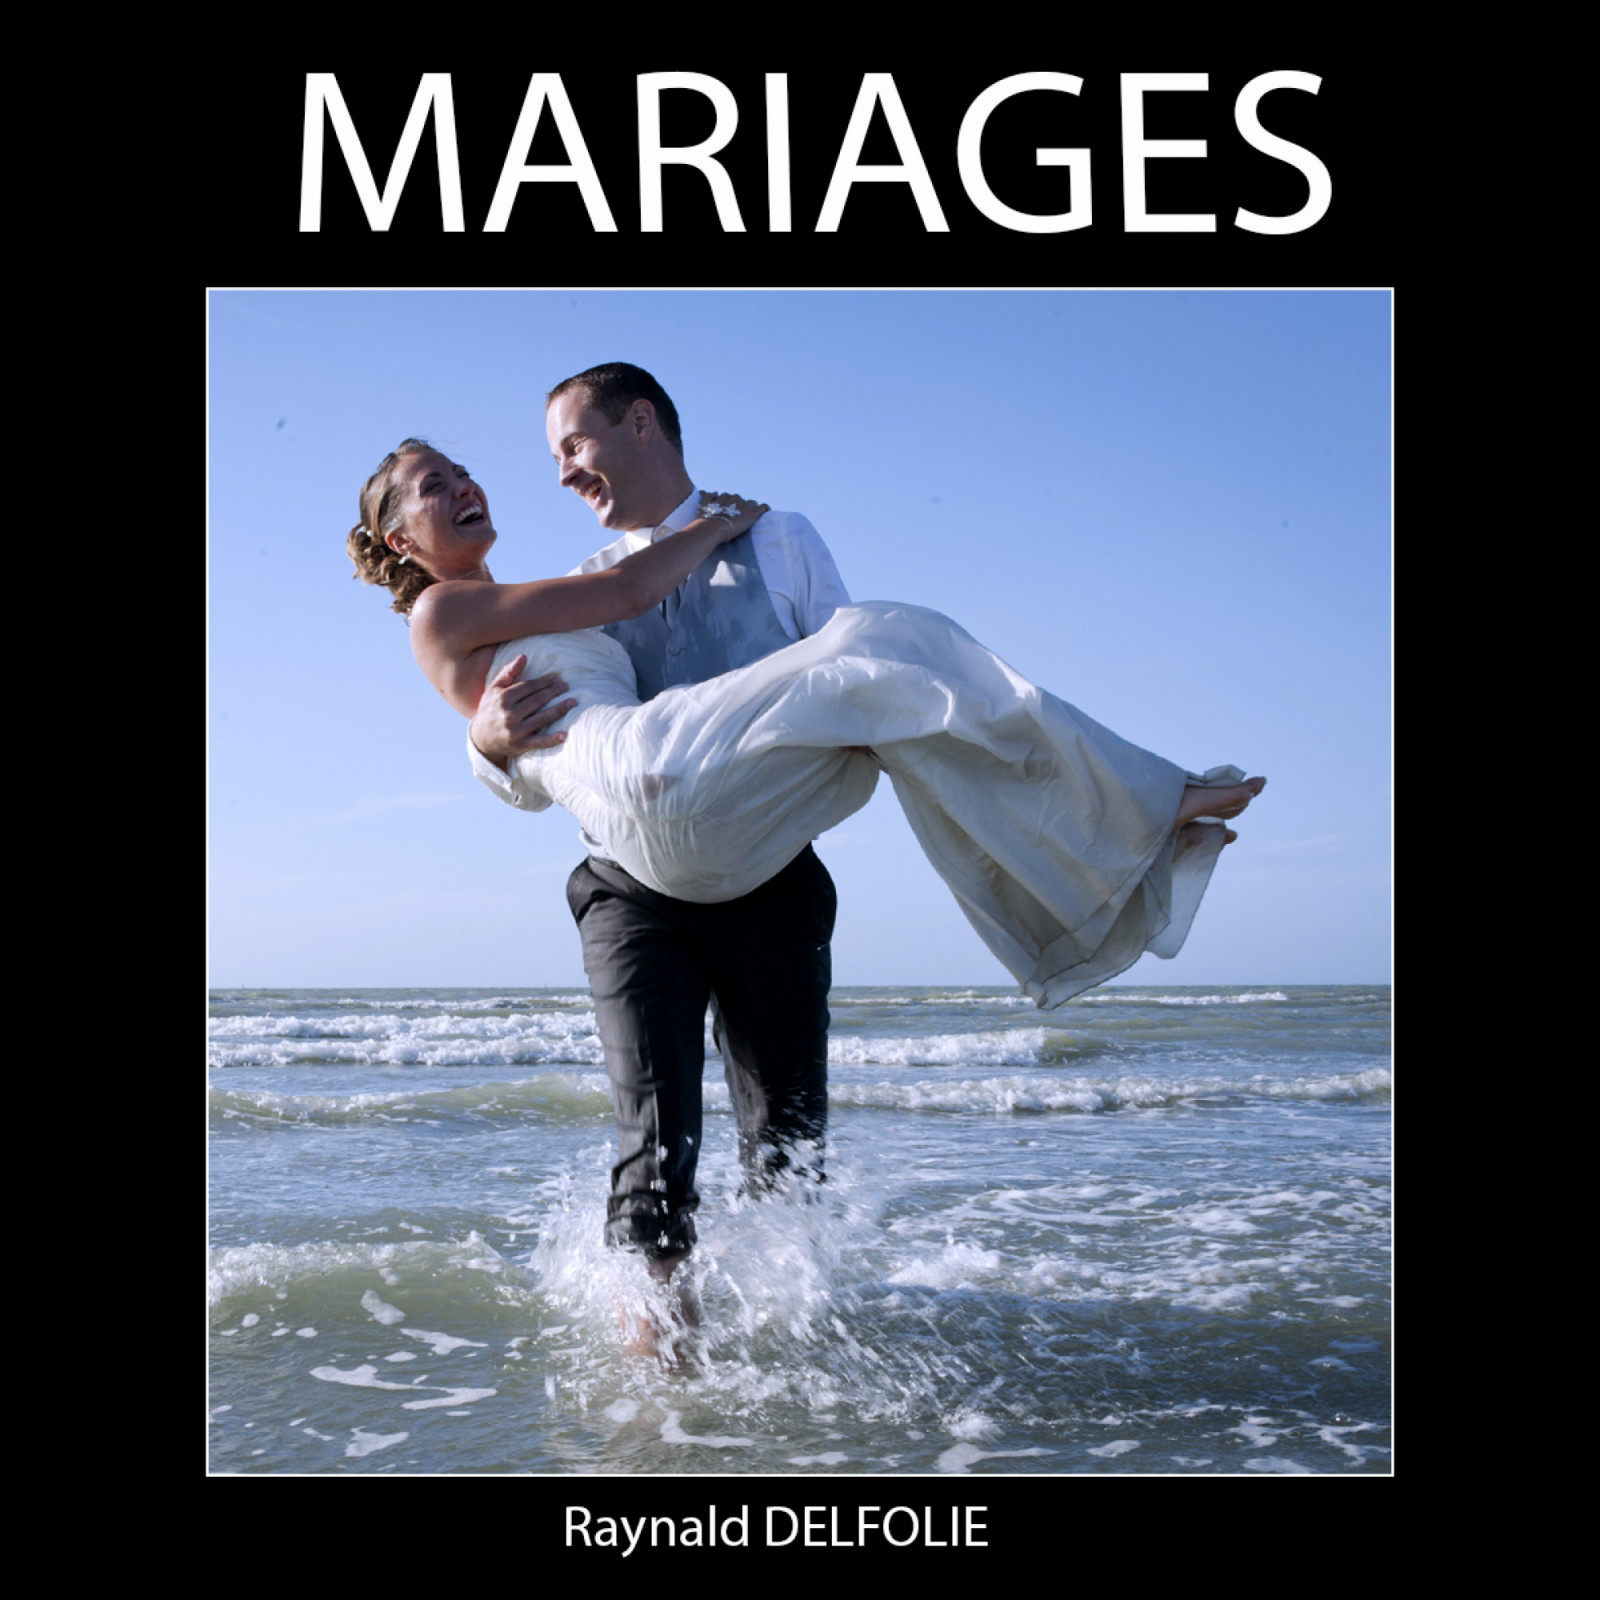 raynald-delfolie 93cef1c24d81